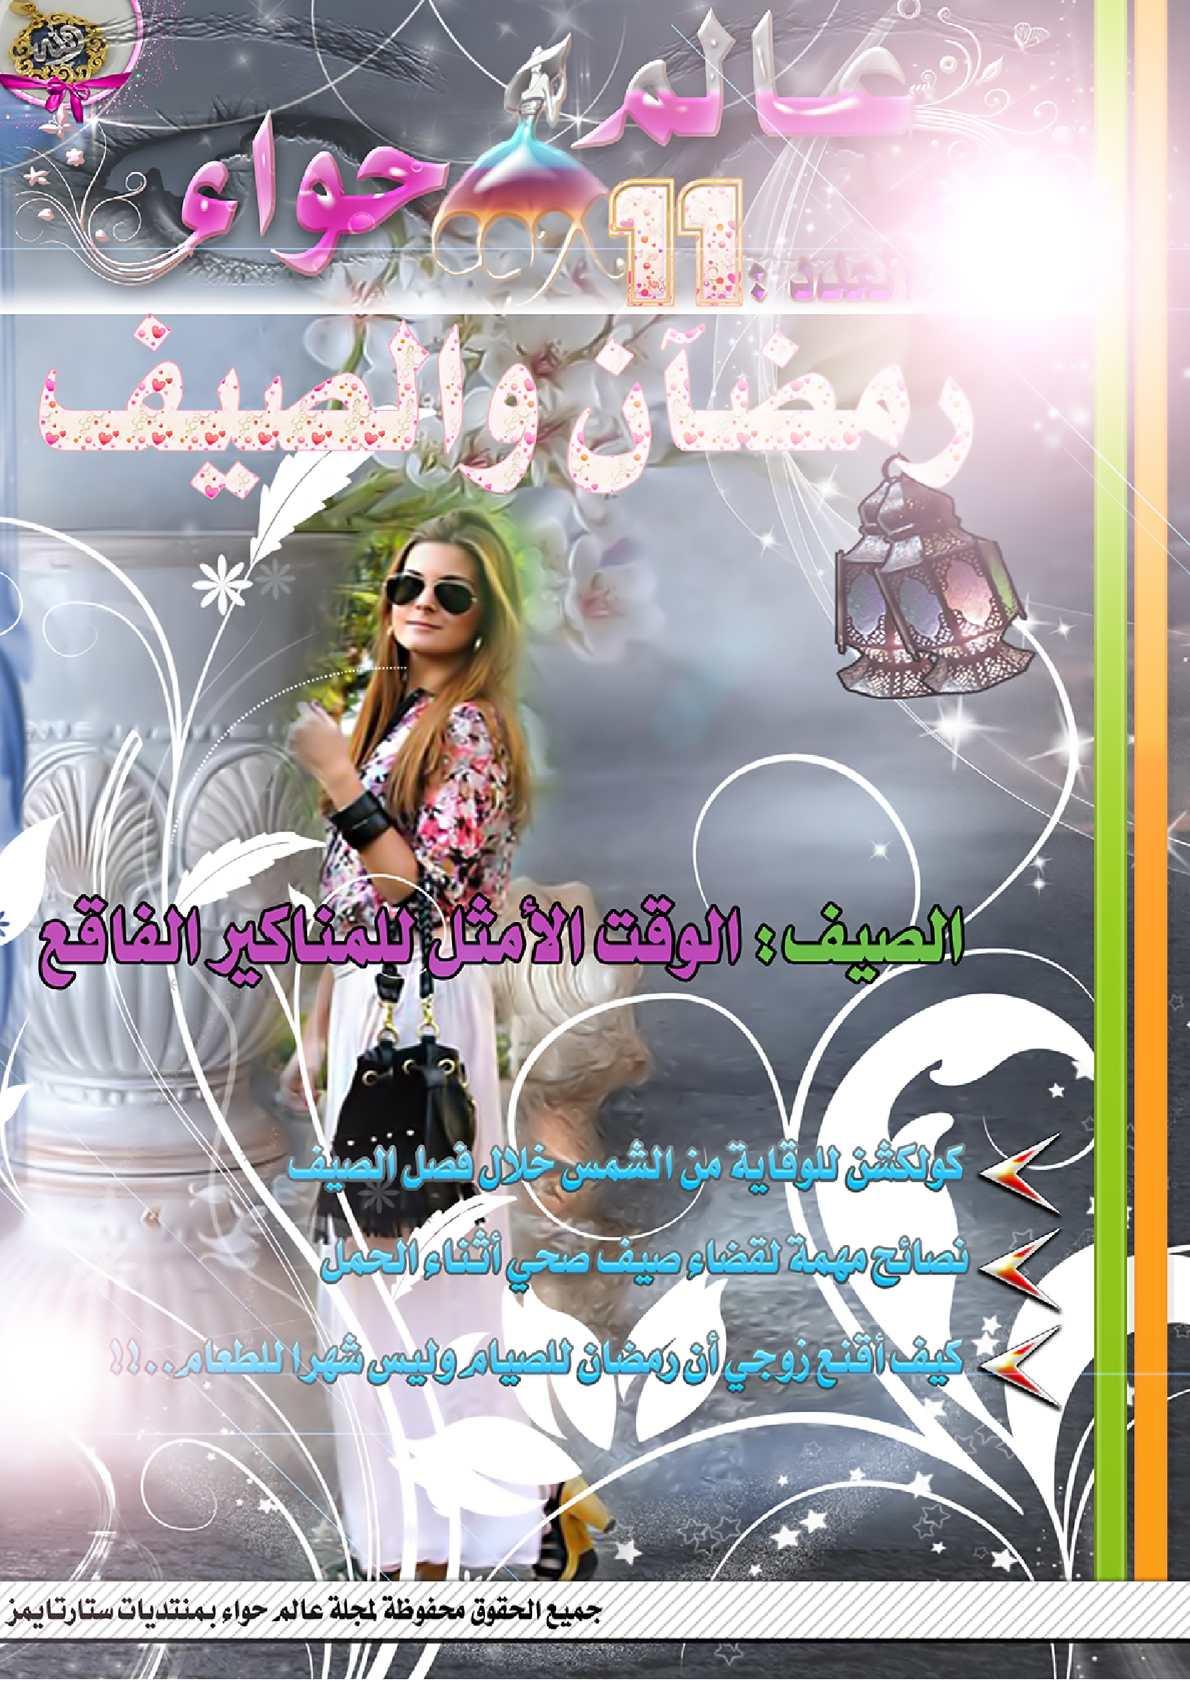 bde2a5c25 Calaméo - مجلة عالم حواء - العدد الحادي عشر بمنتديات ستار تايمز